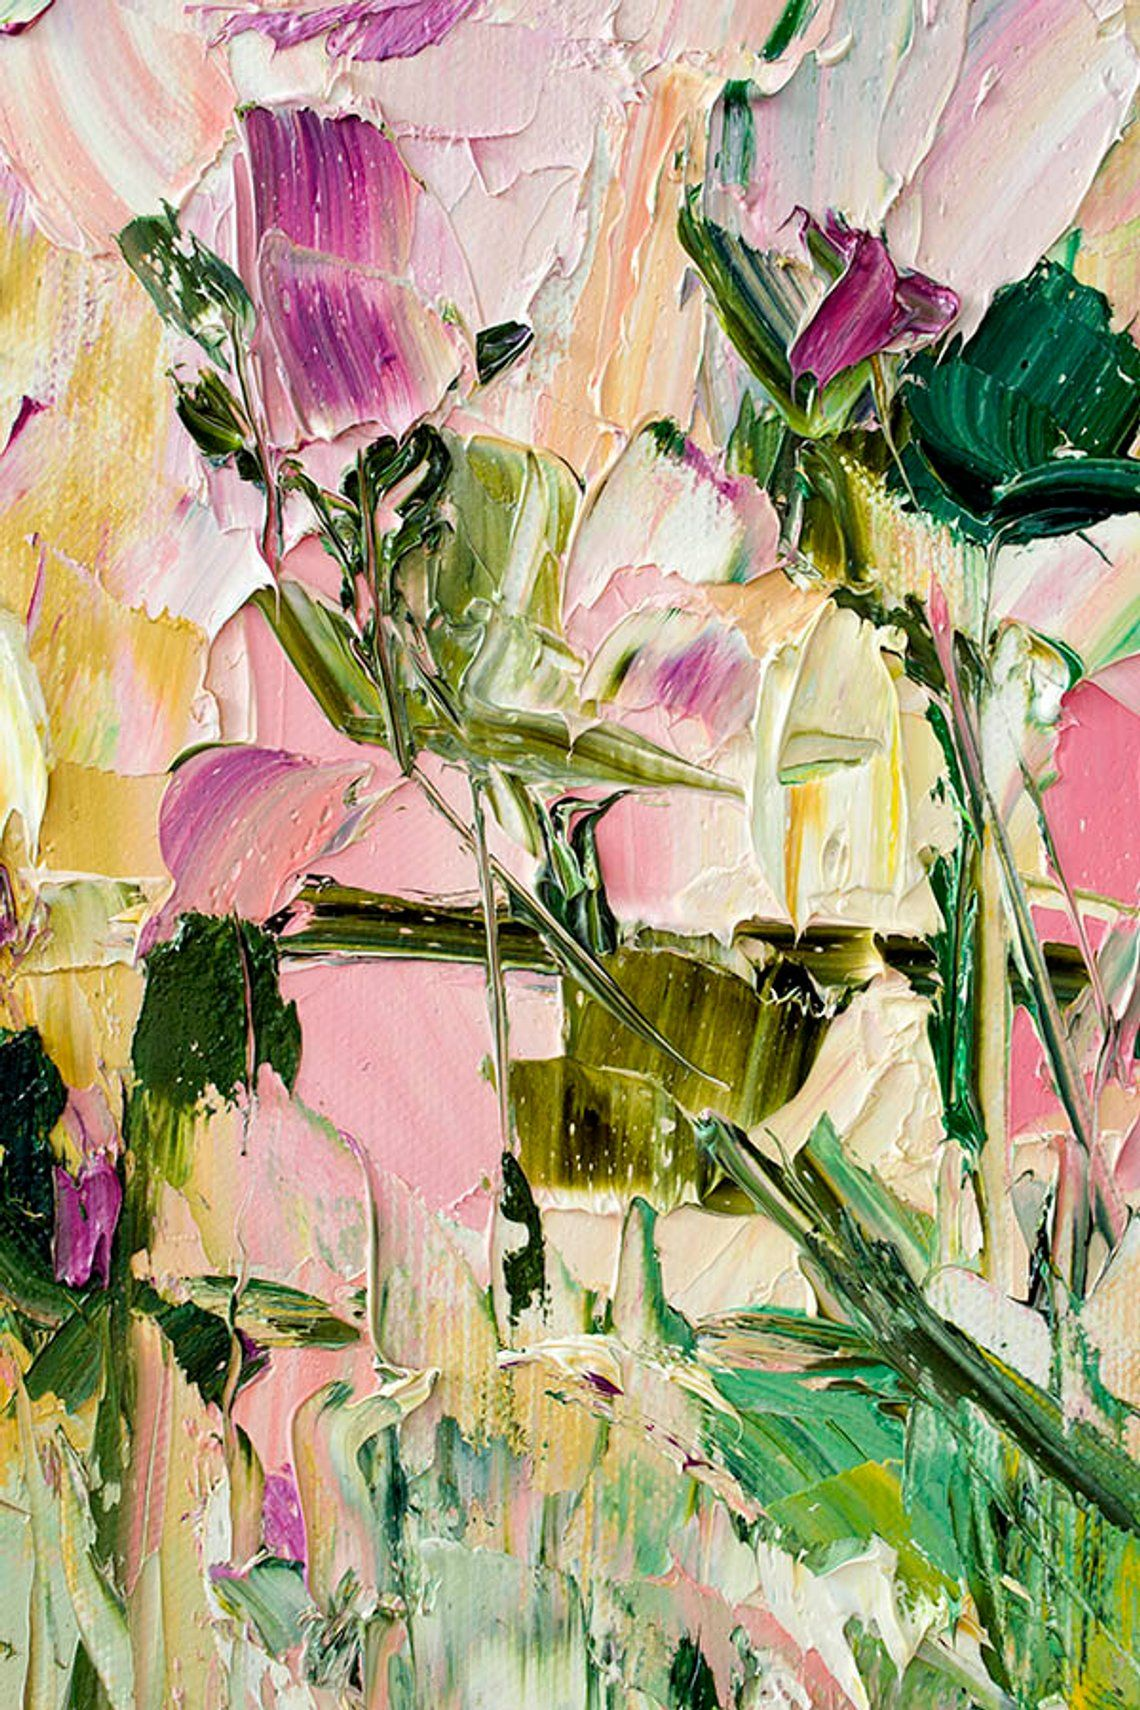 Rabatt Gelbe Blumen Malerei Leinwand 2020 Gelbe Blumen Malerei